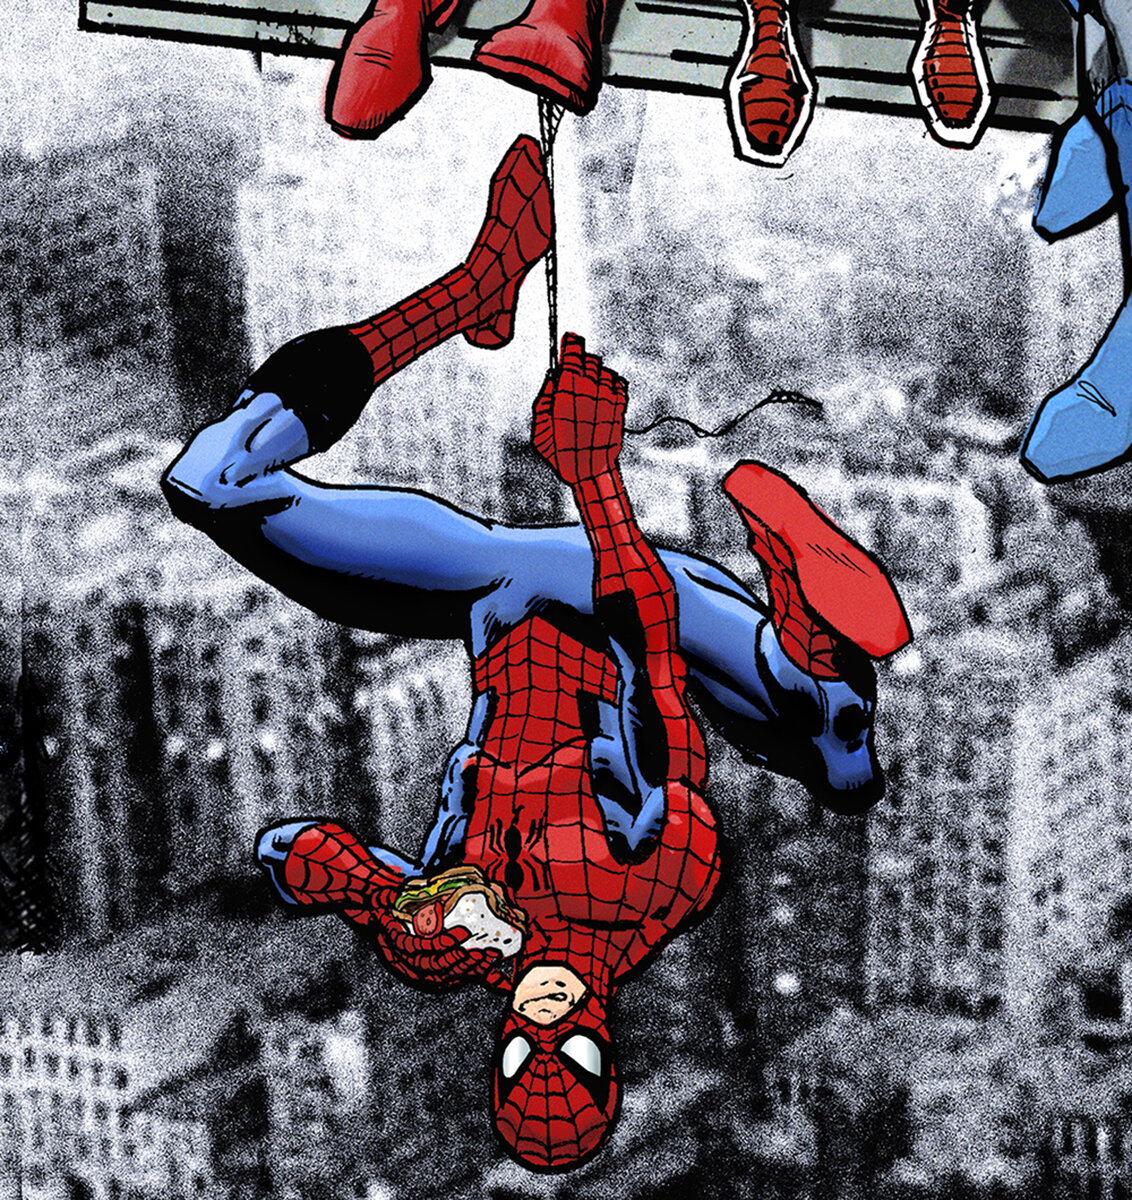 BOvv Dan+Avenell+Marvel+DC+Lunch+Atop+A+Skyscraperw+Captain+America,+Iron+Man,+Batman,+Wolverine,+Deadpool,+Hulk,+Flash,+Spider-Man+and+Superman.jpg